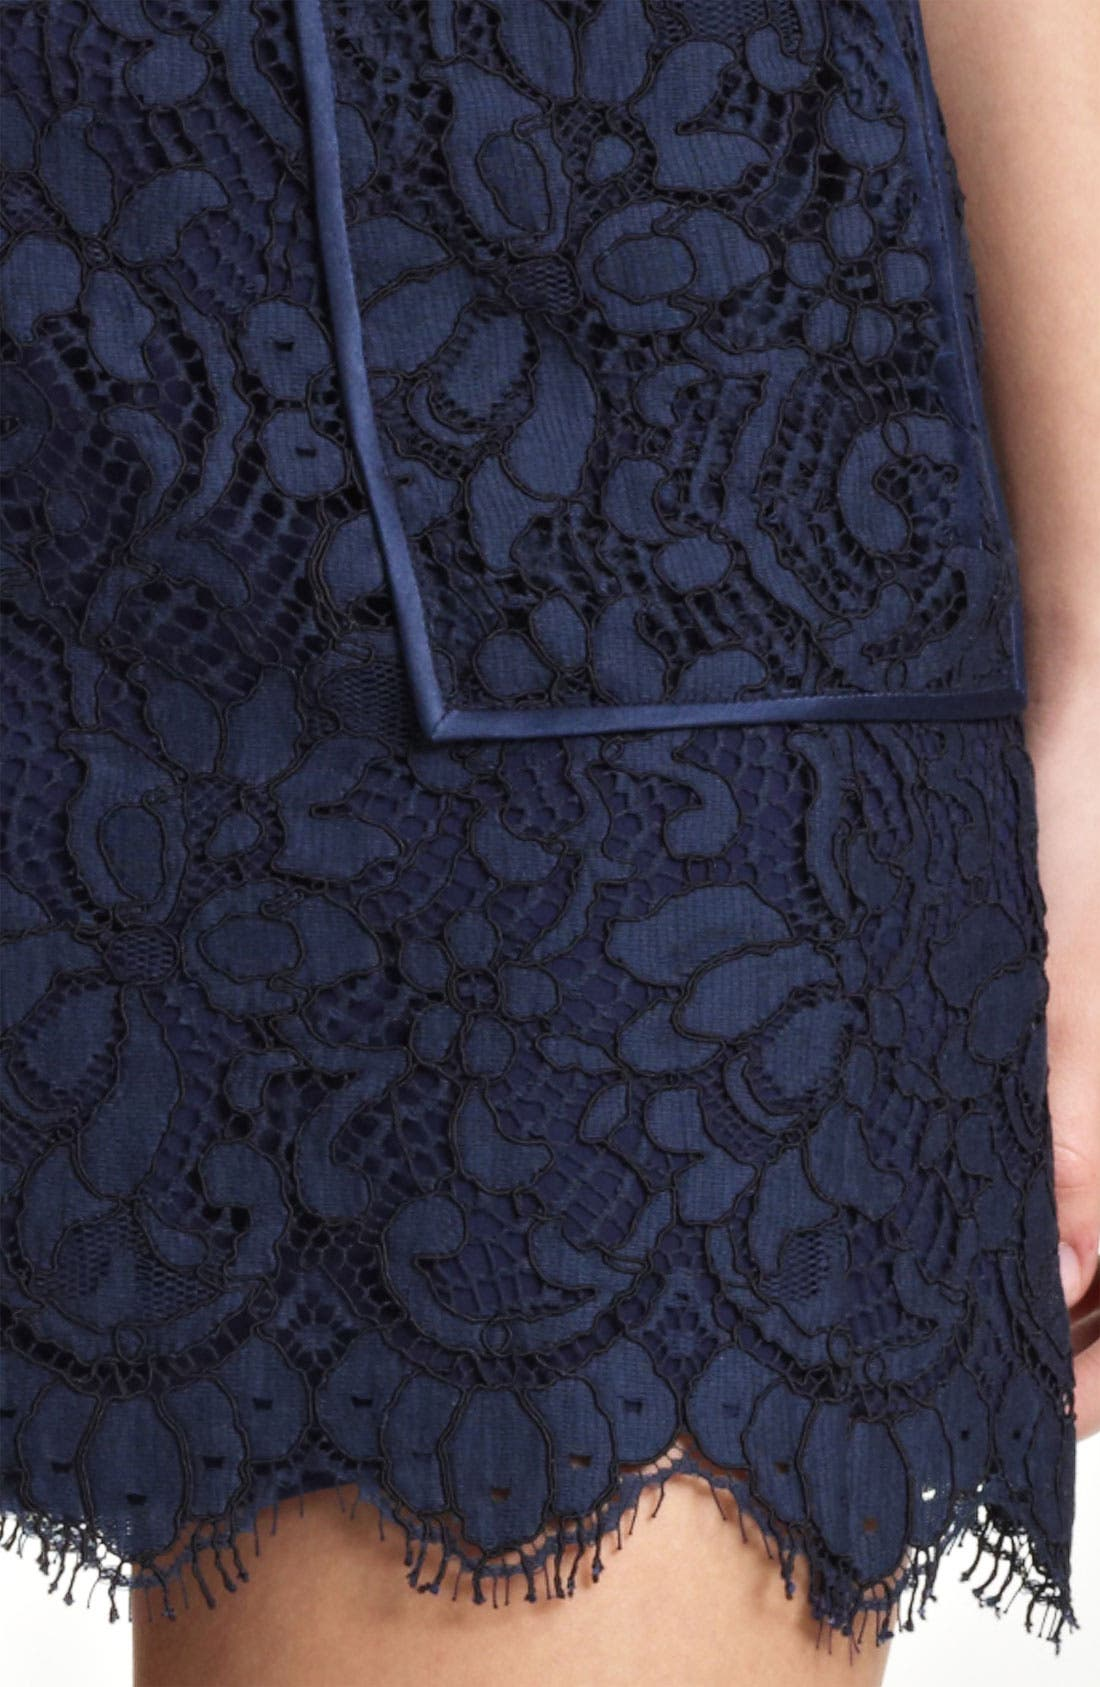 Patch Pocket Lace Skirt,                             Alternate thumbnail 4, color,                             410